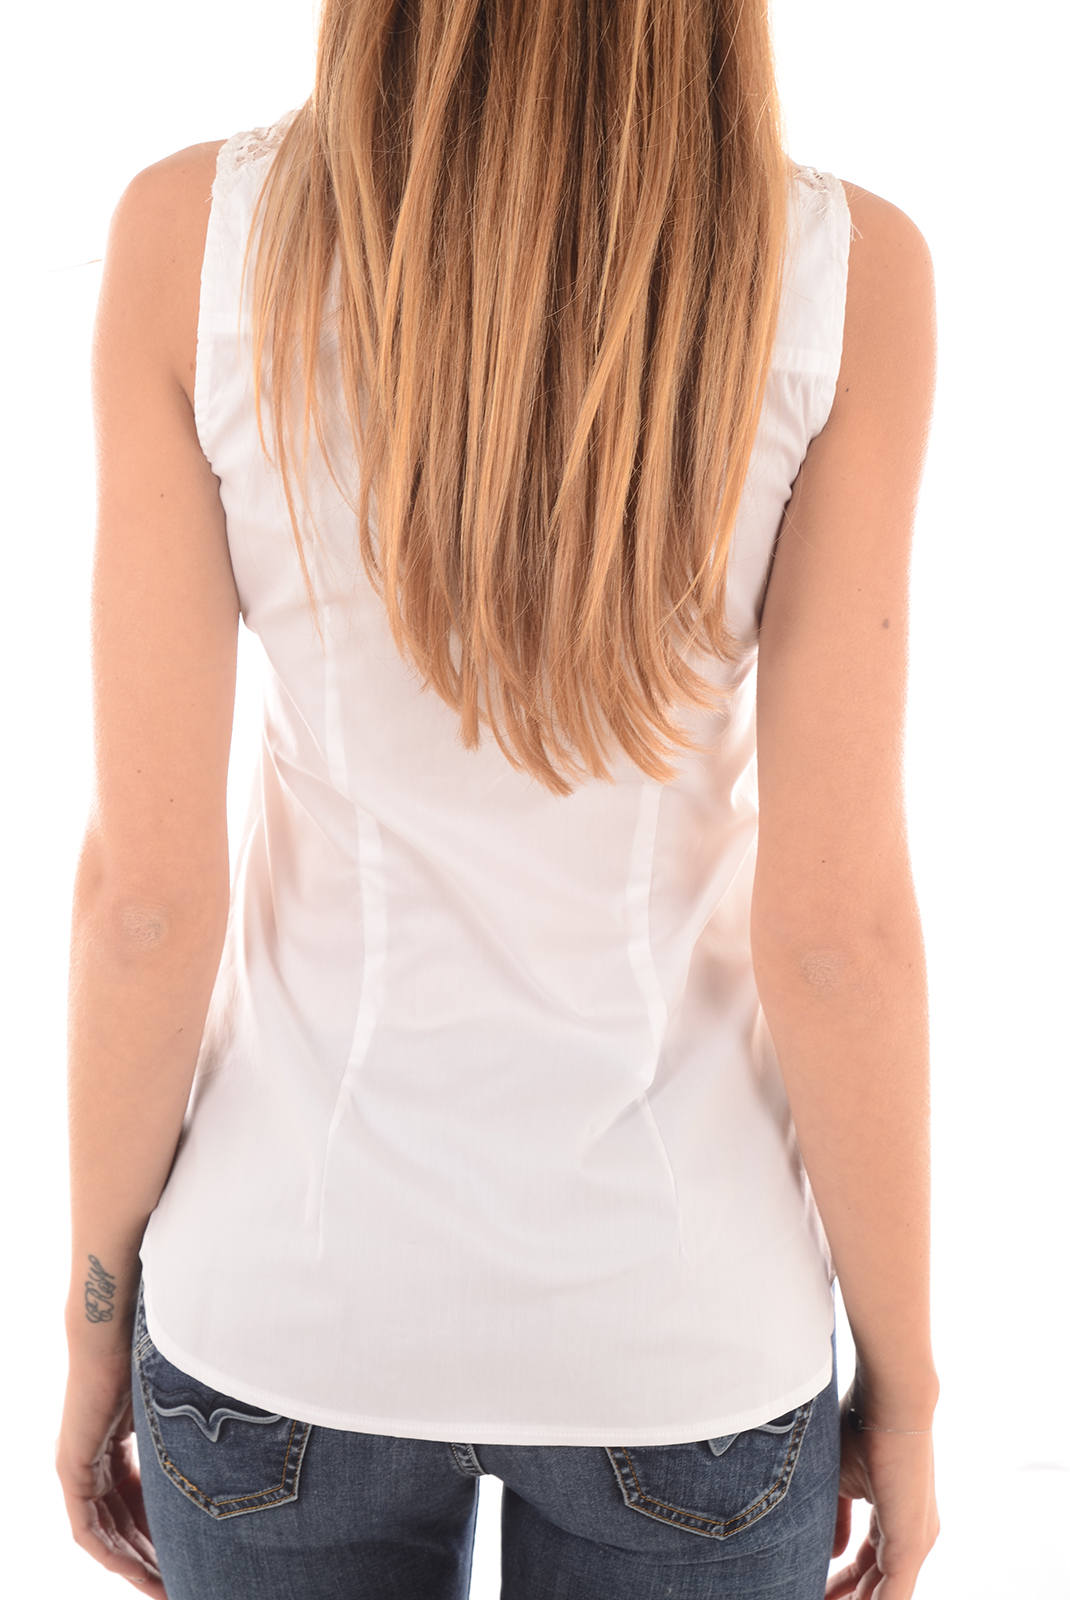 FEMME  Guess jeans W61H10EK600 A000 BLANC